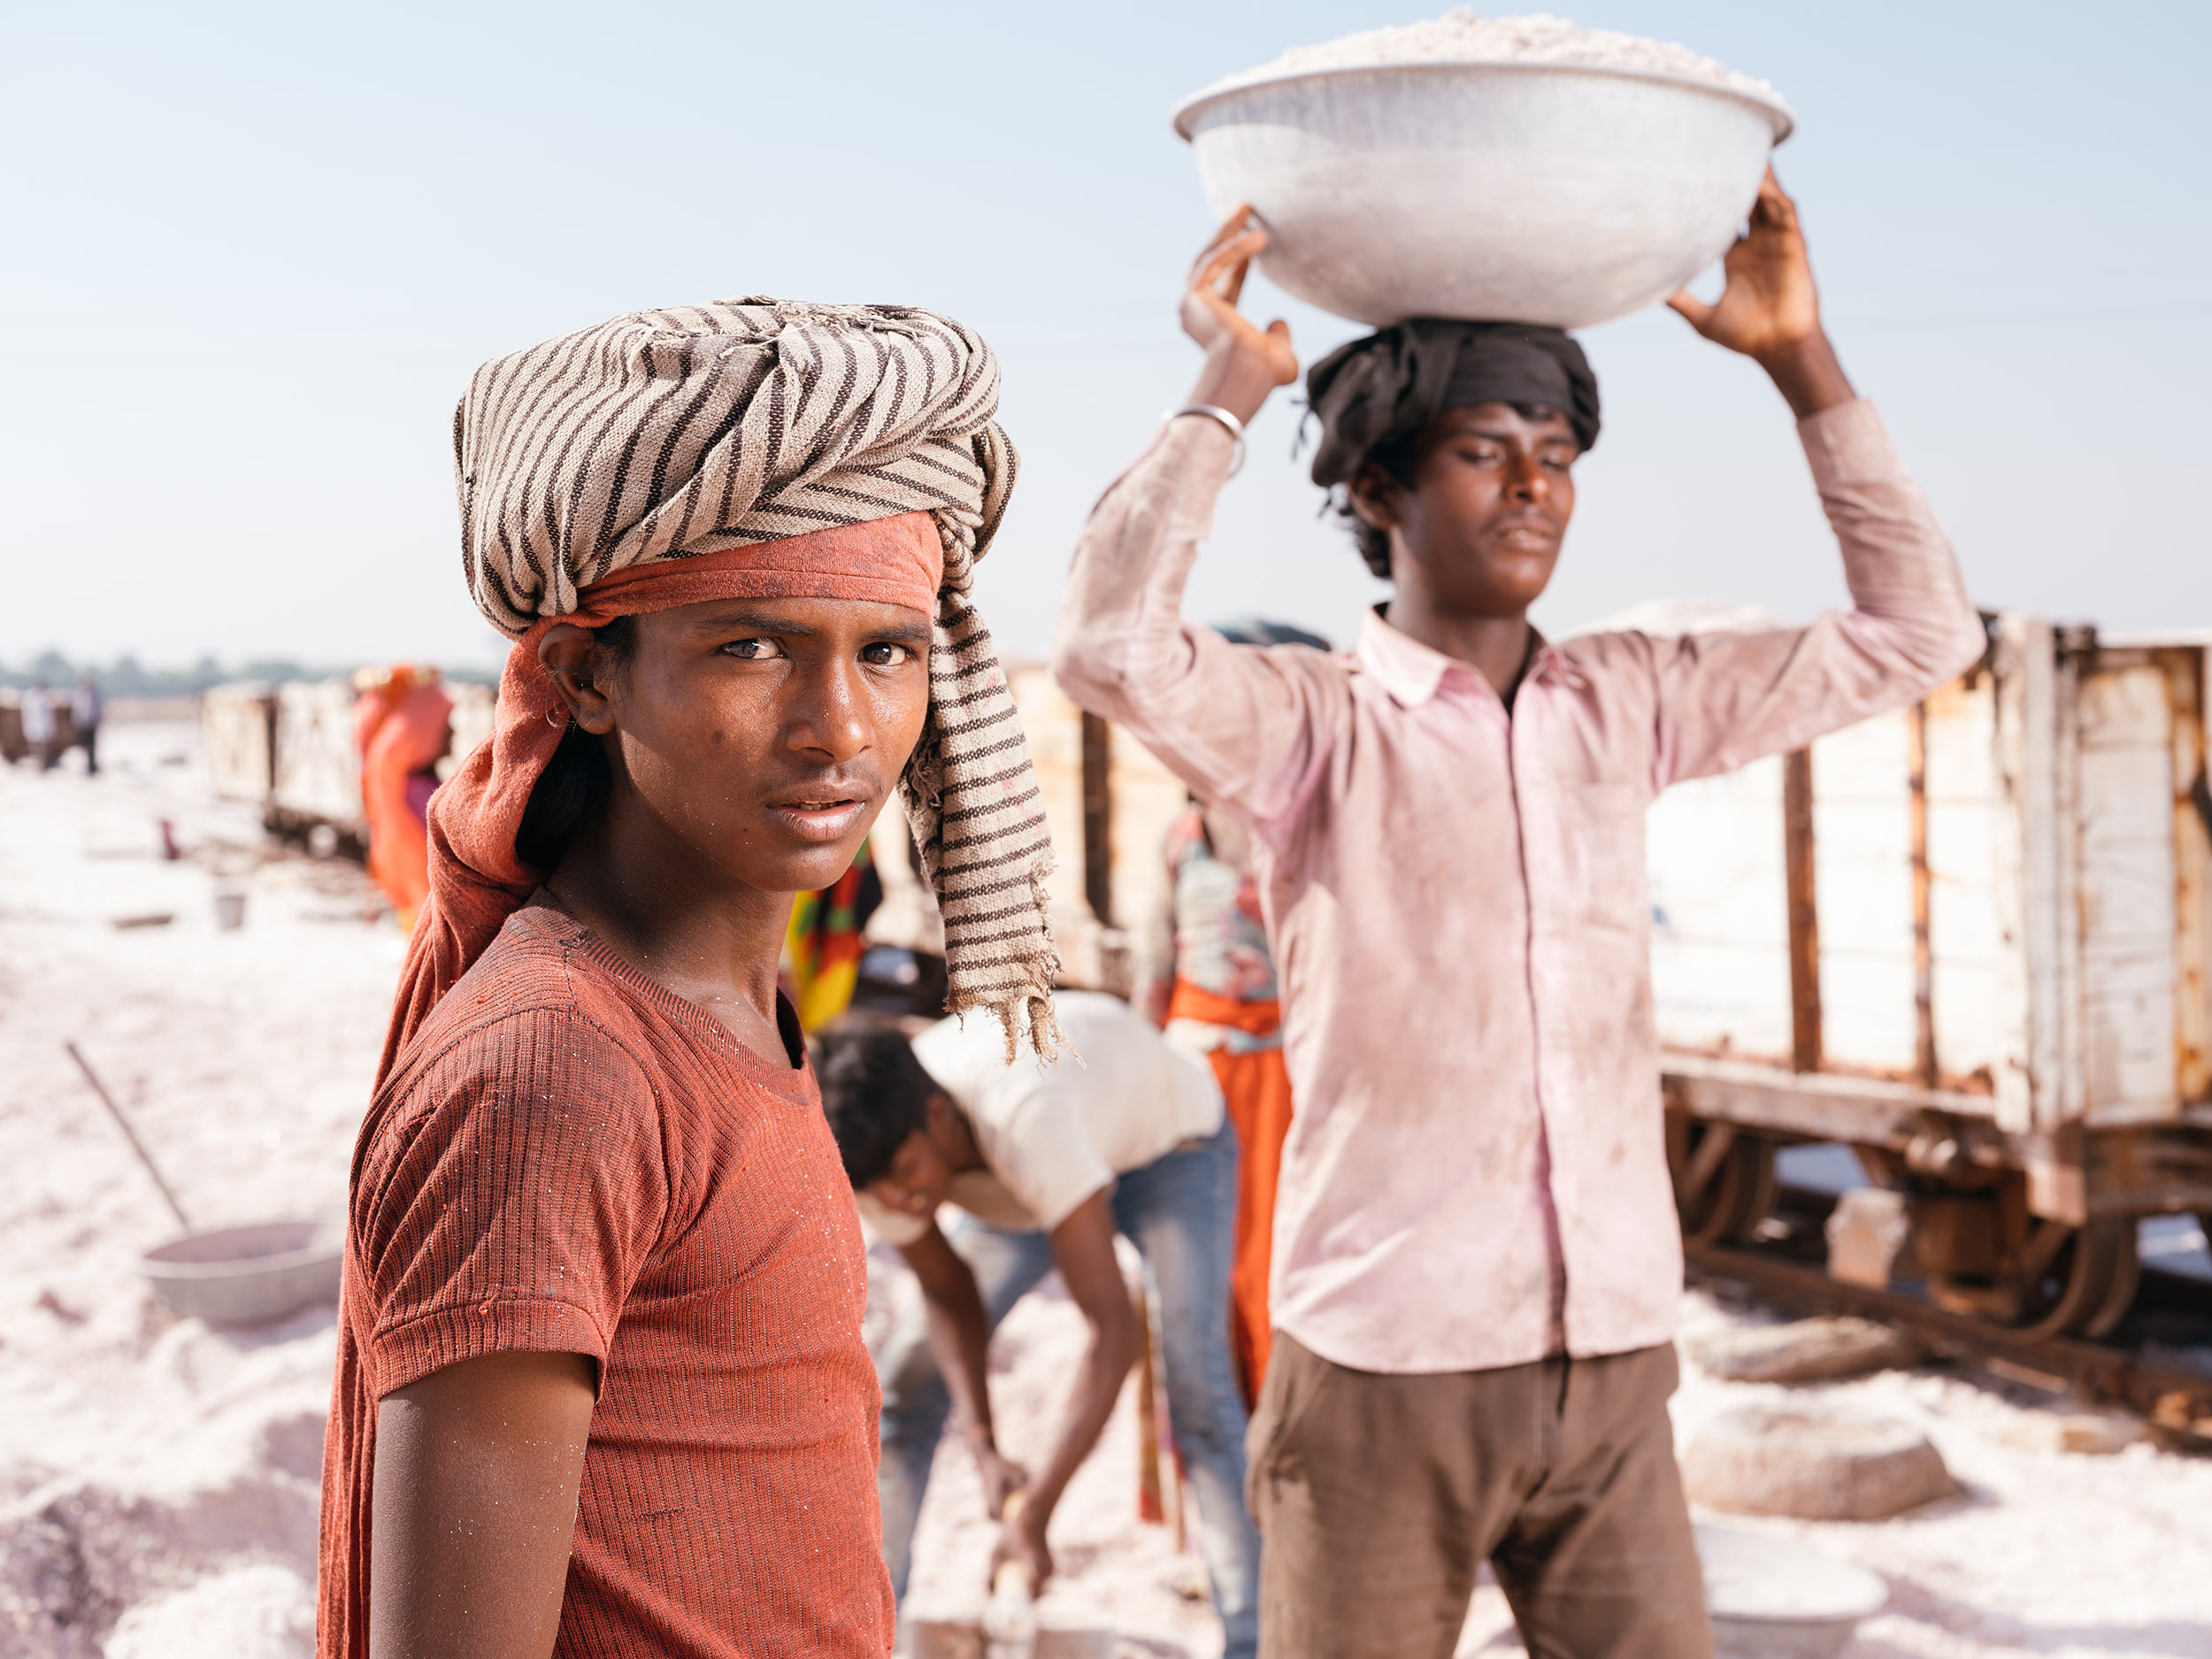 India_SaltFlats_0010_05529.jpg